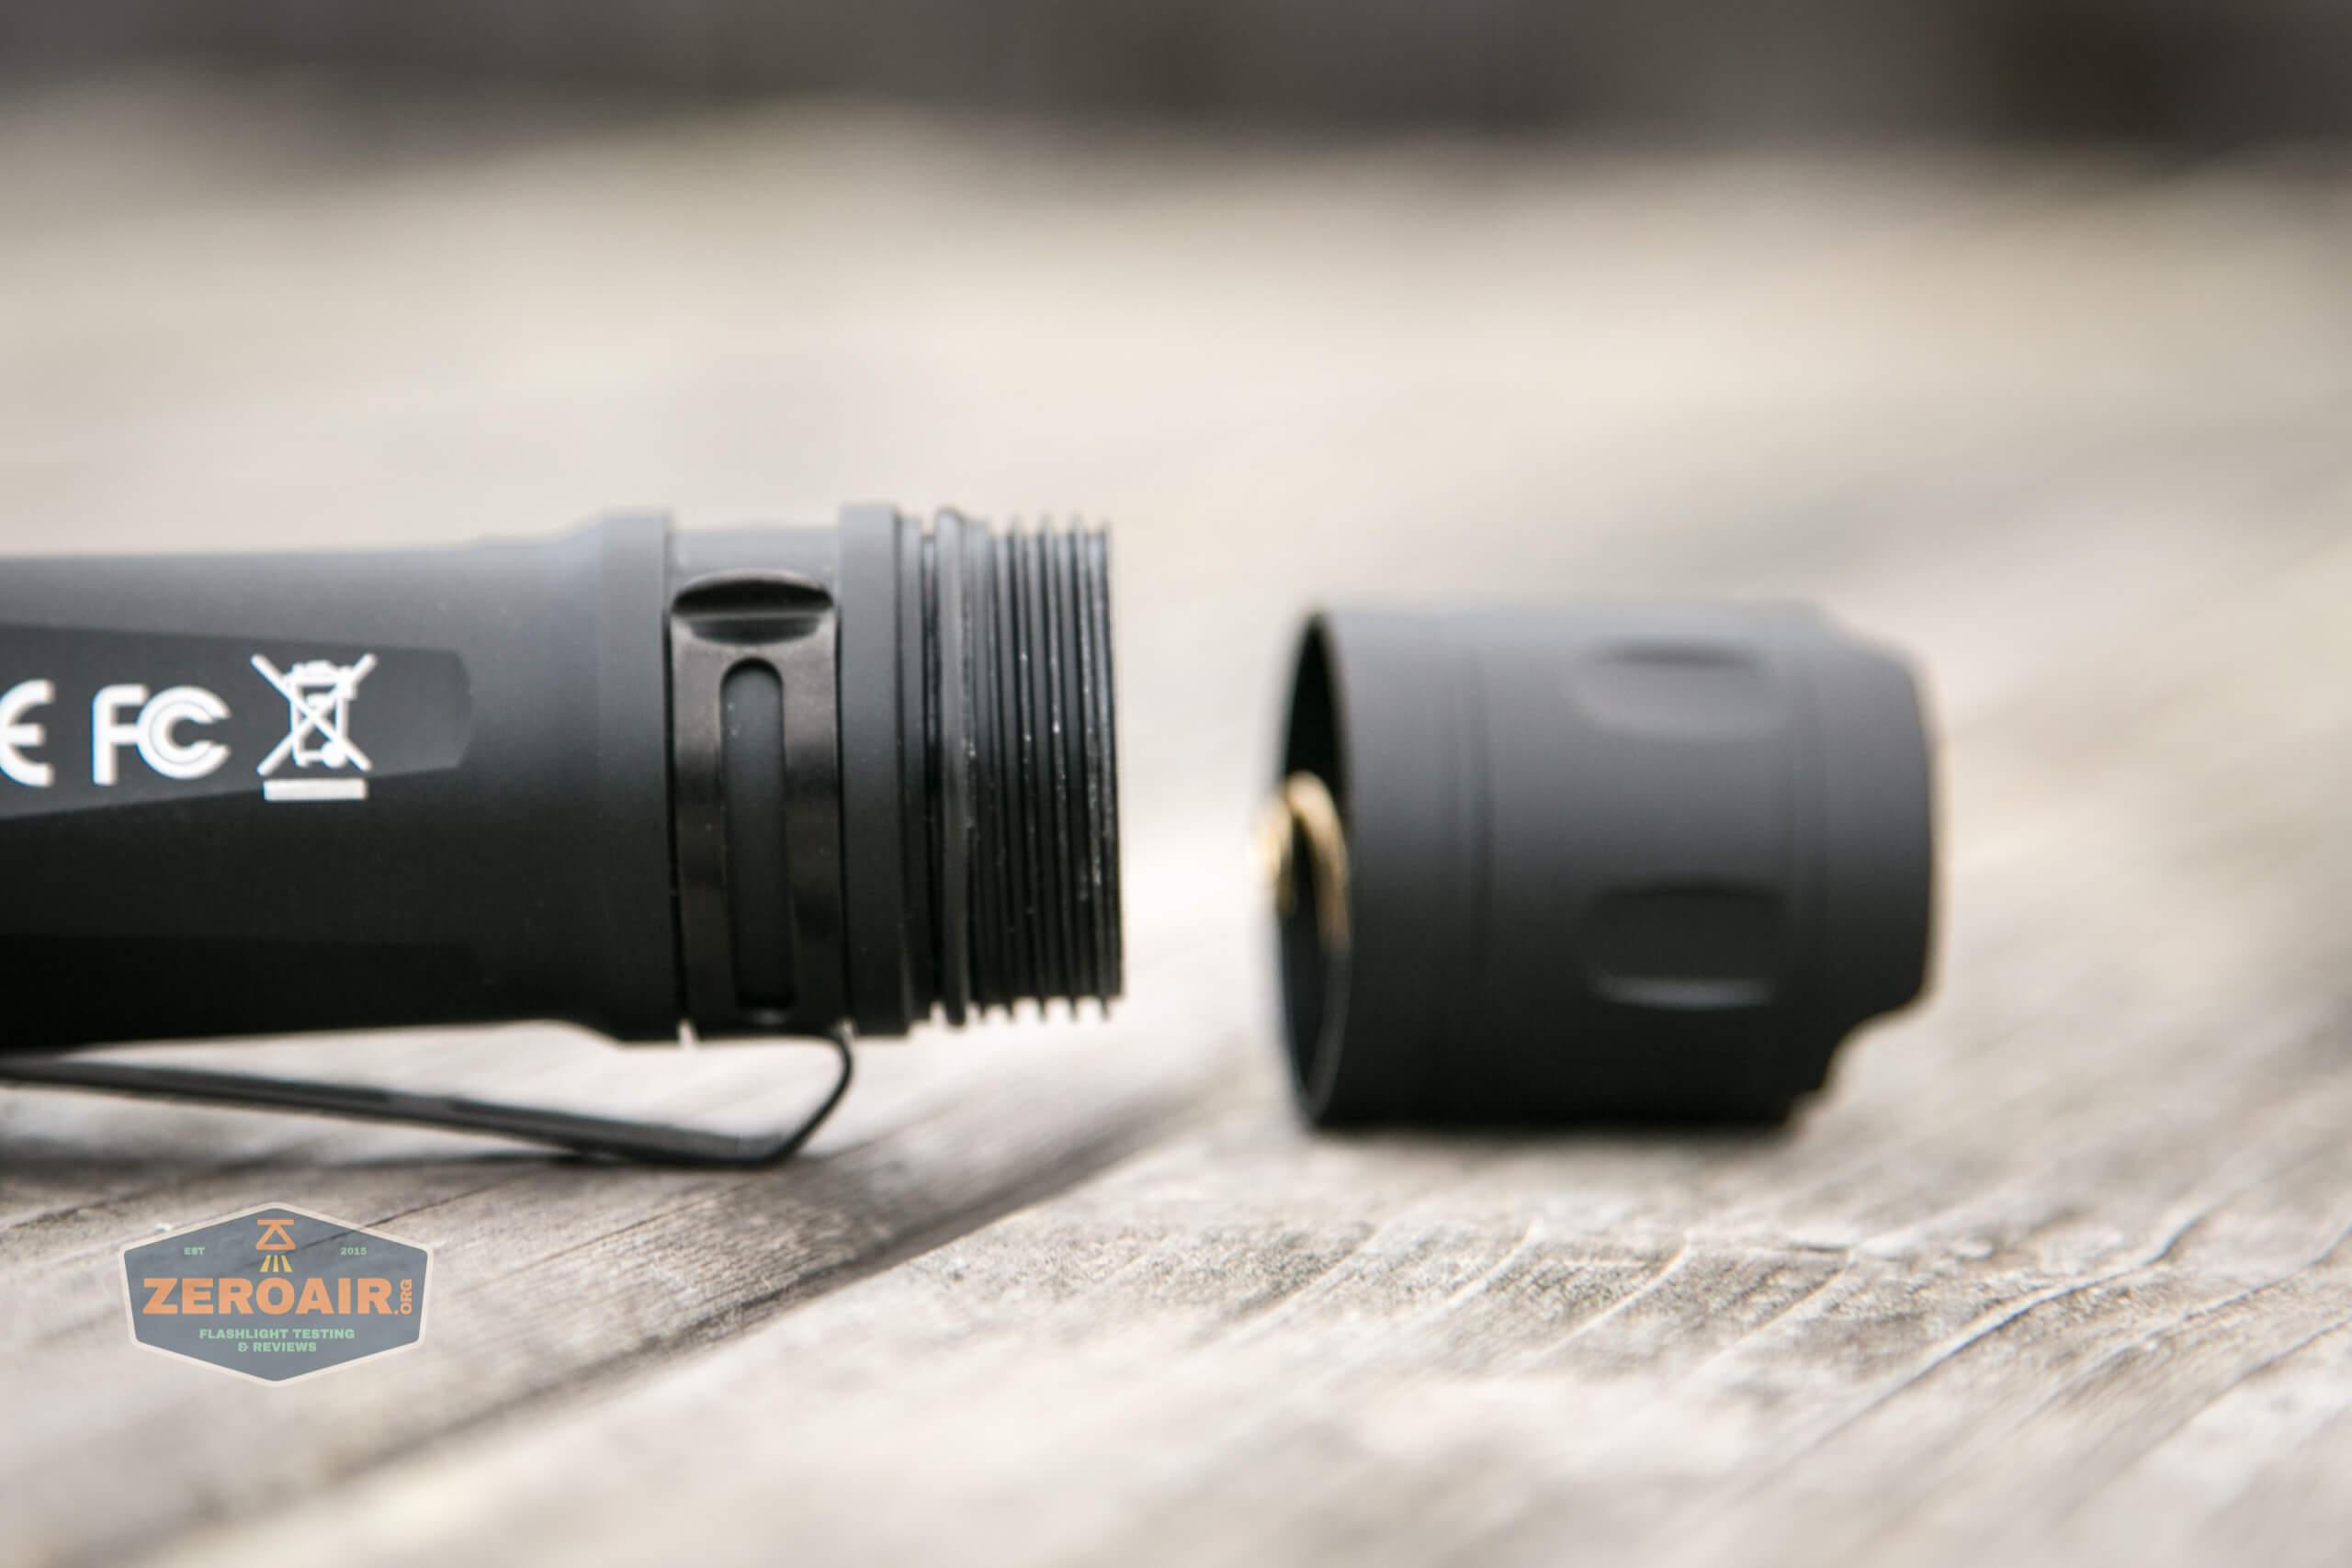 Cyansky P25 Flashlight body threads